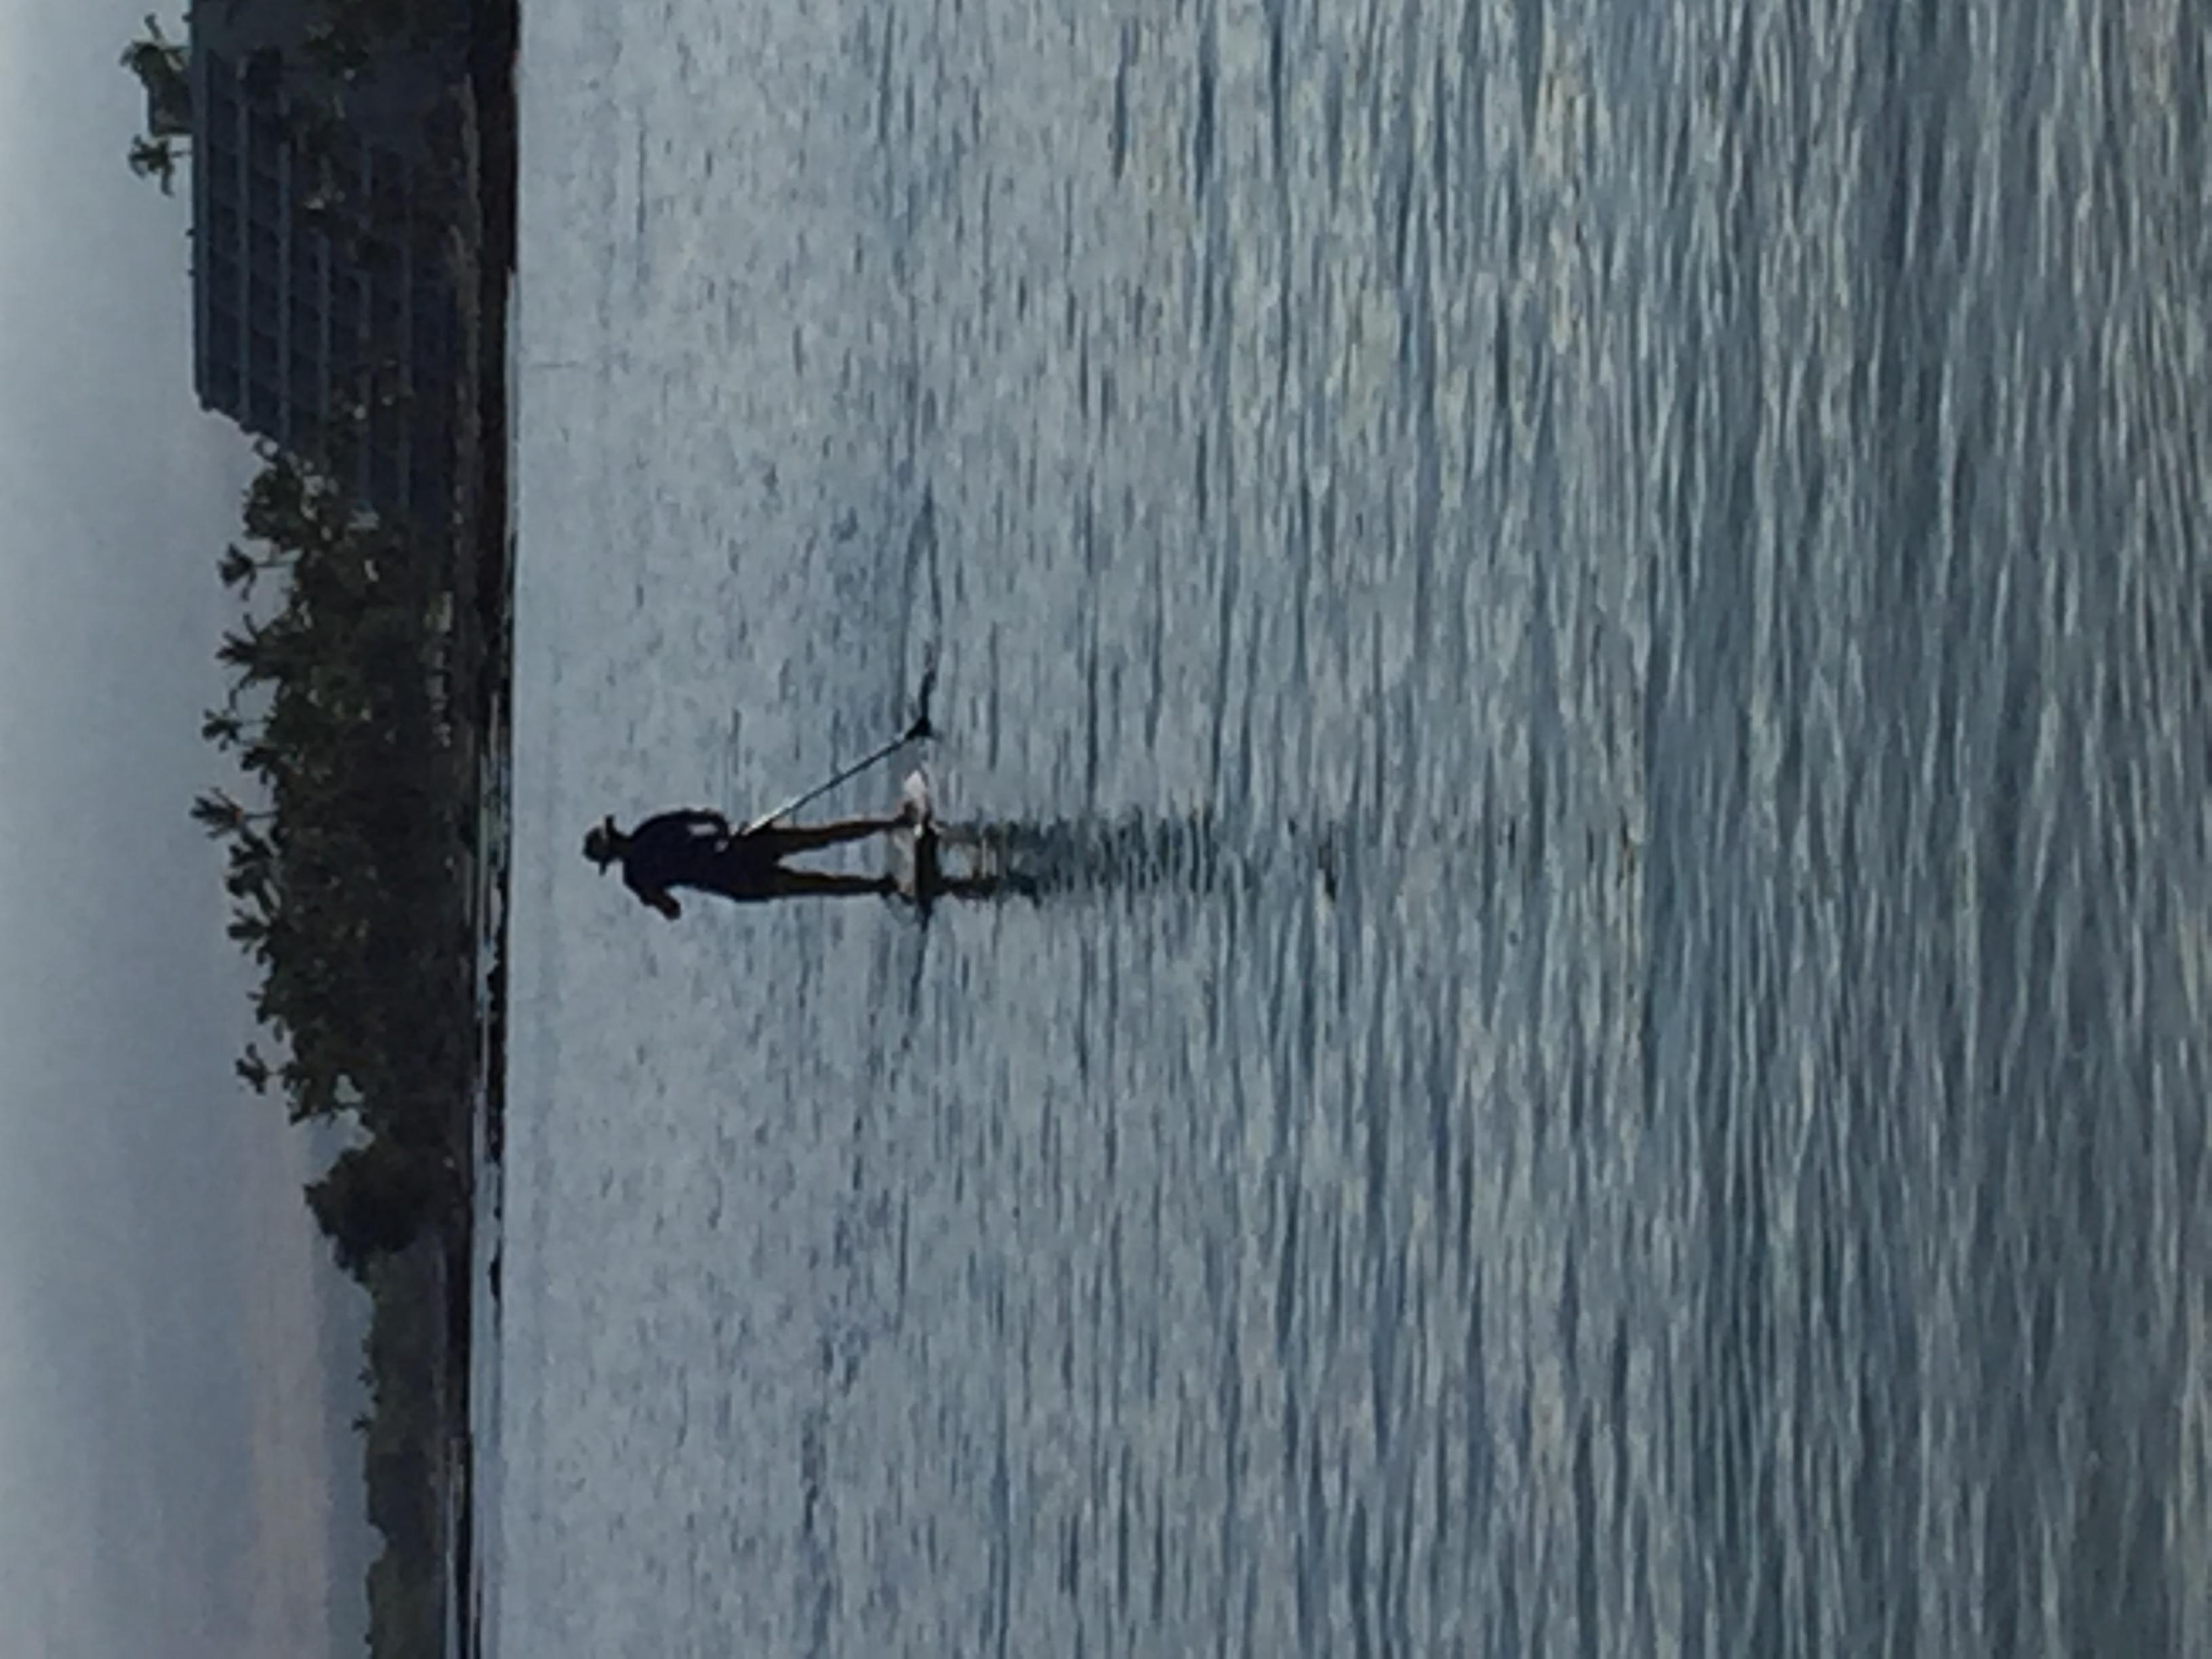 Makaiwa Bay paddler